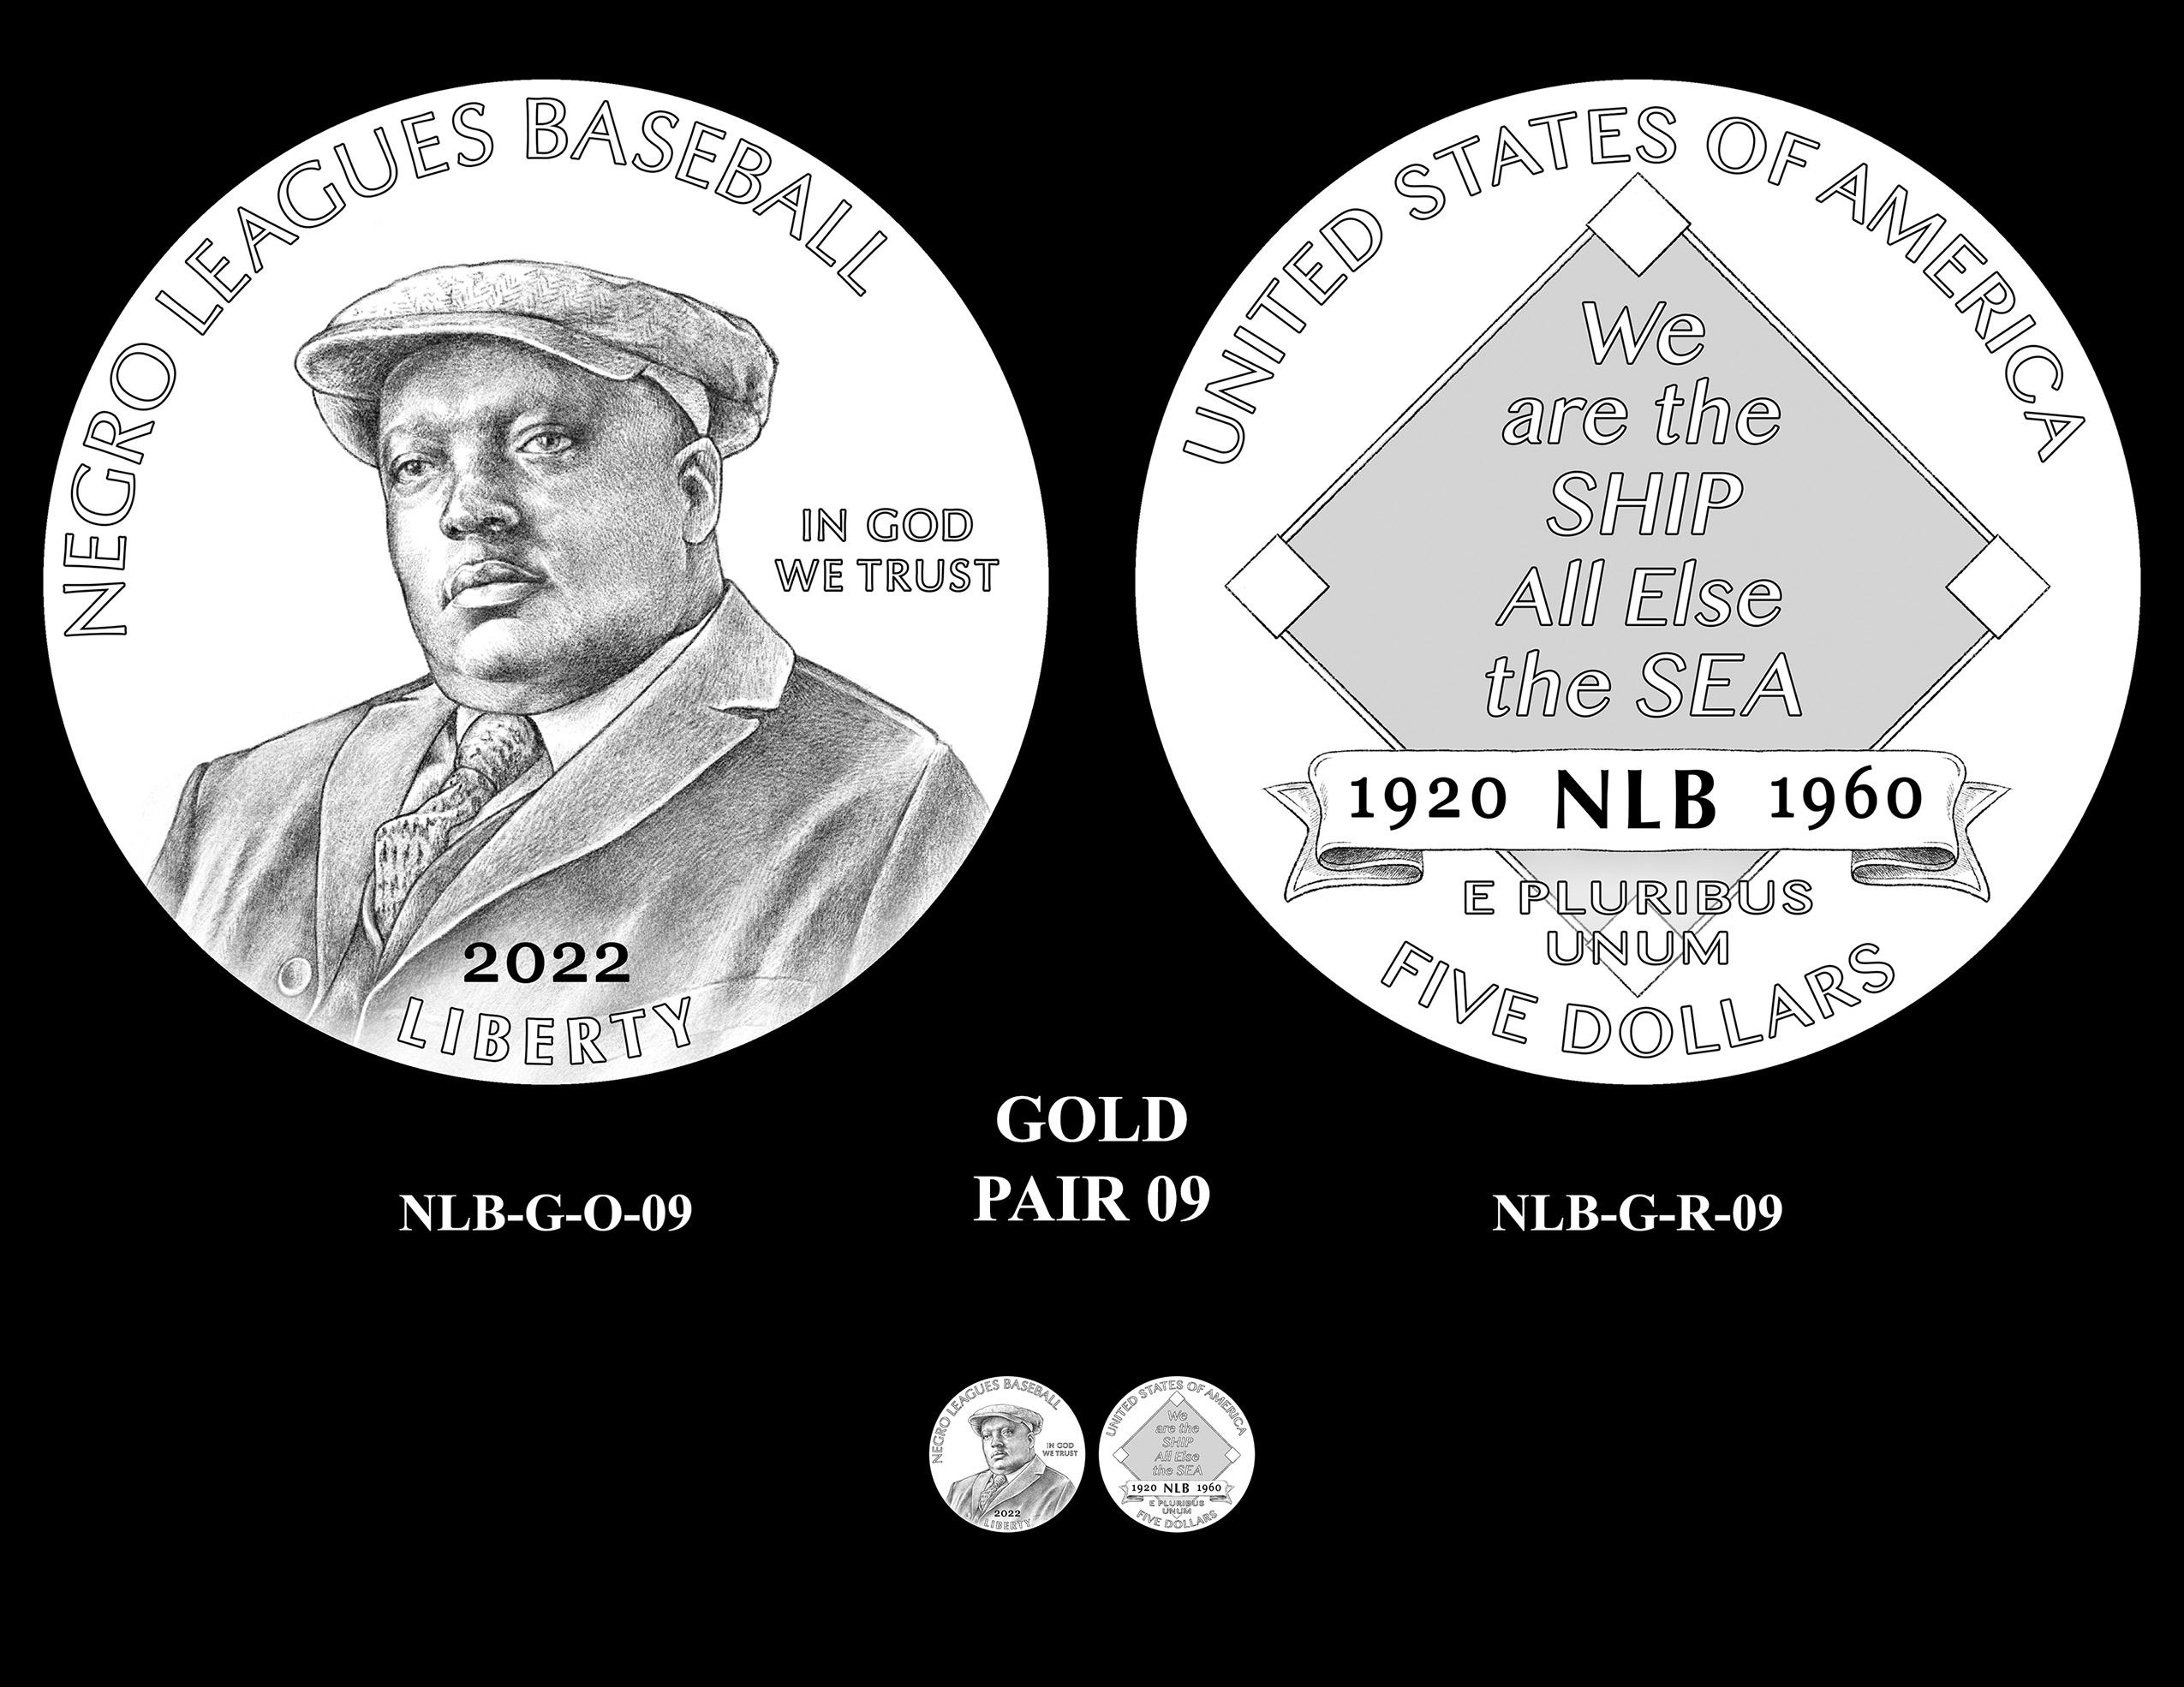 Gold Pair 09 -- Negro Leagues Baseball Commemorative Coin Program